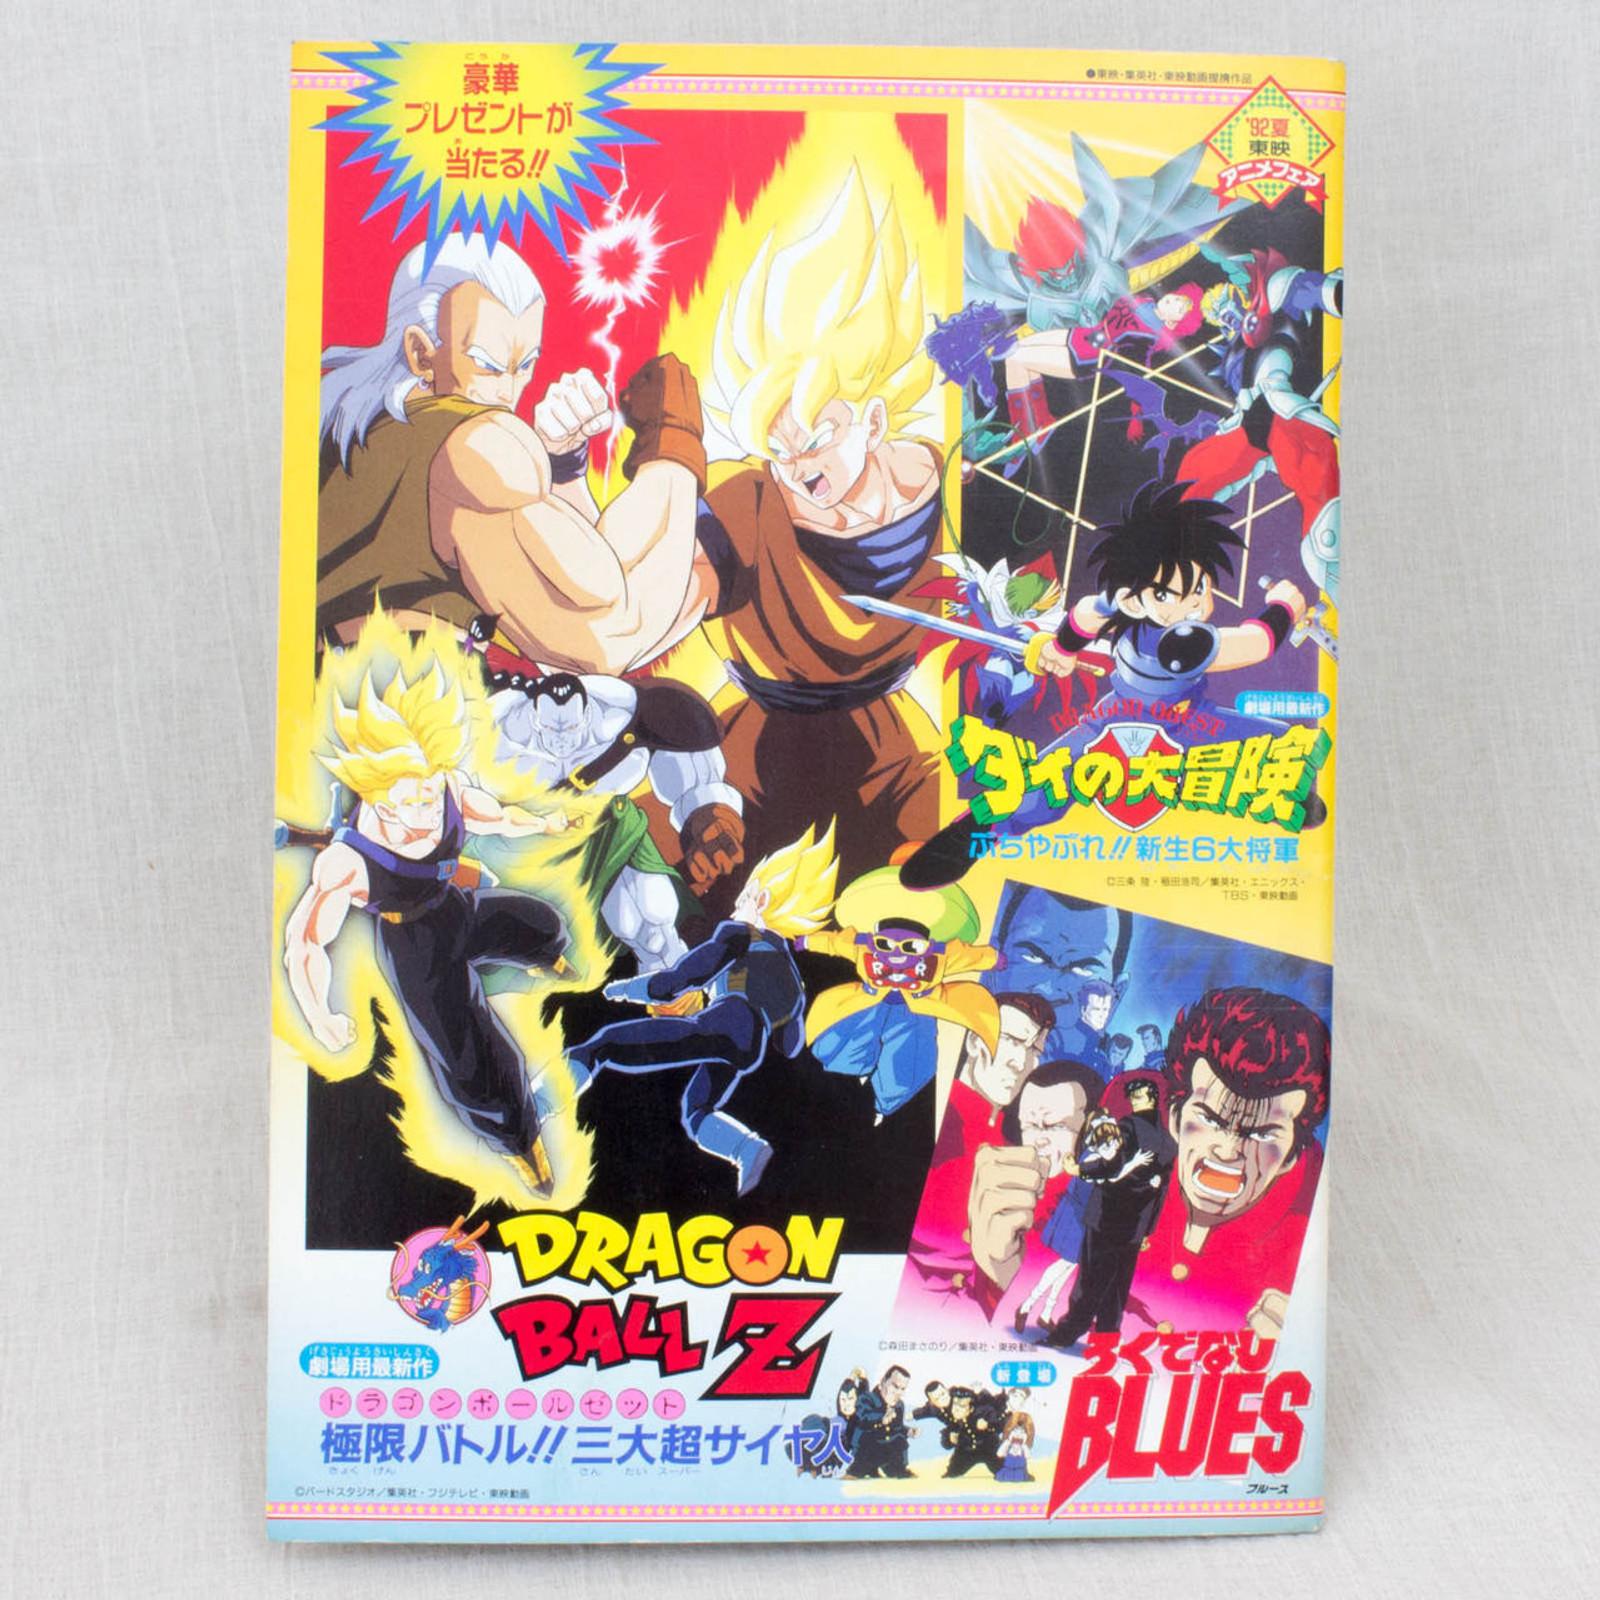 Dragon Ball / The Adventure of Dai Movie Program Art Book 1992 JAPAN ANIME MANGA 2